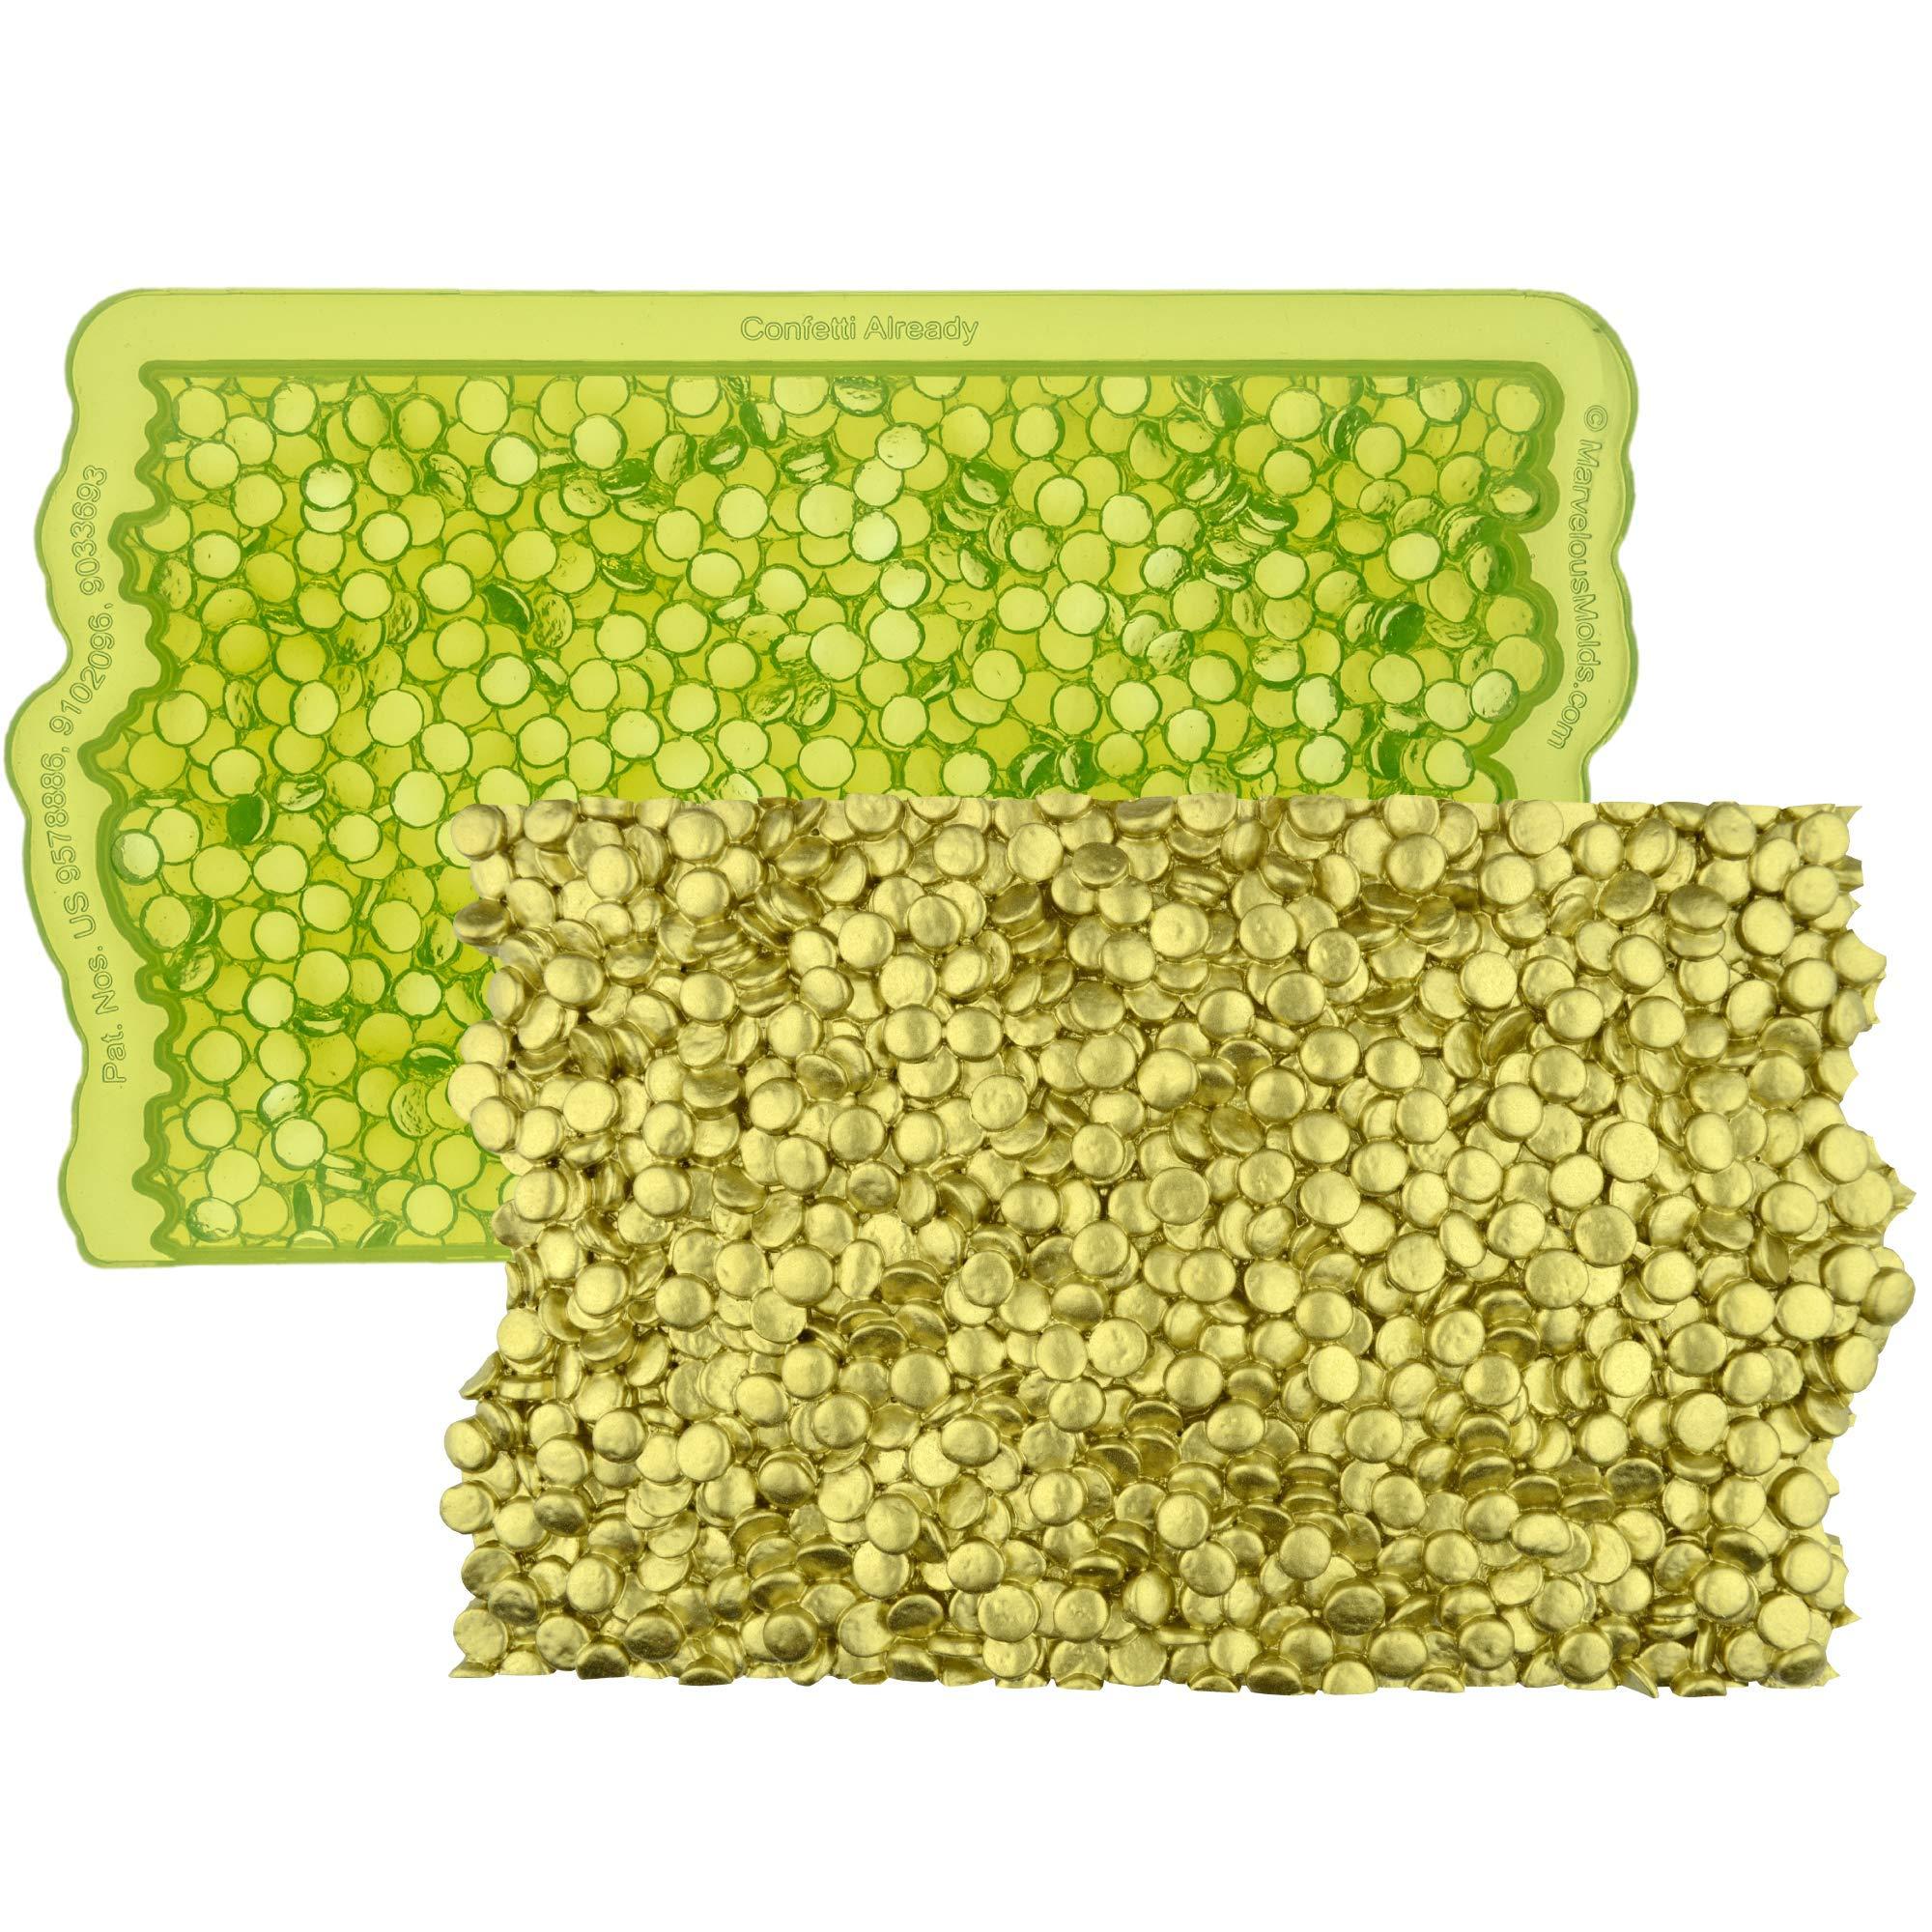 Marvelous Molds Confetti Already Simpress Silicone Mold | Cake Decorating | Fondant Gum Paste by Marvelous Molds (Image #1)